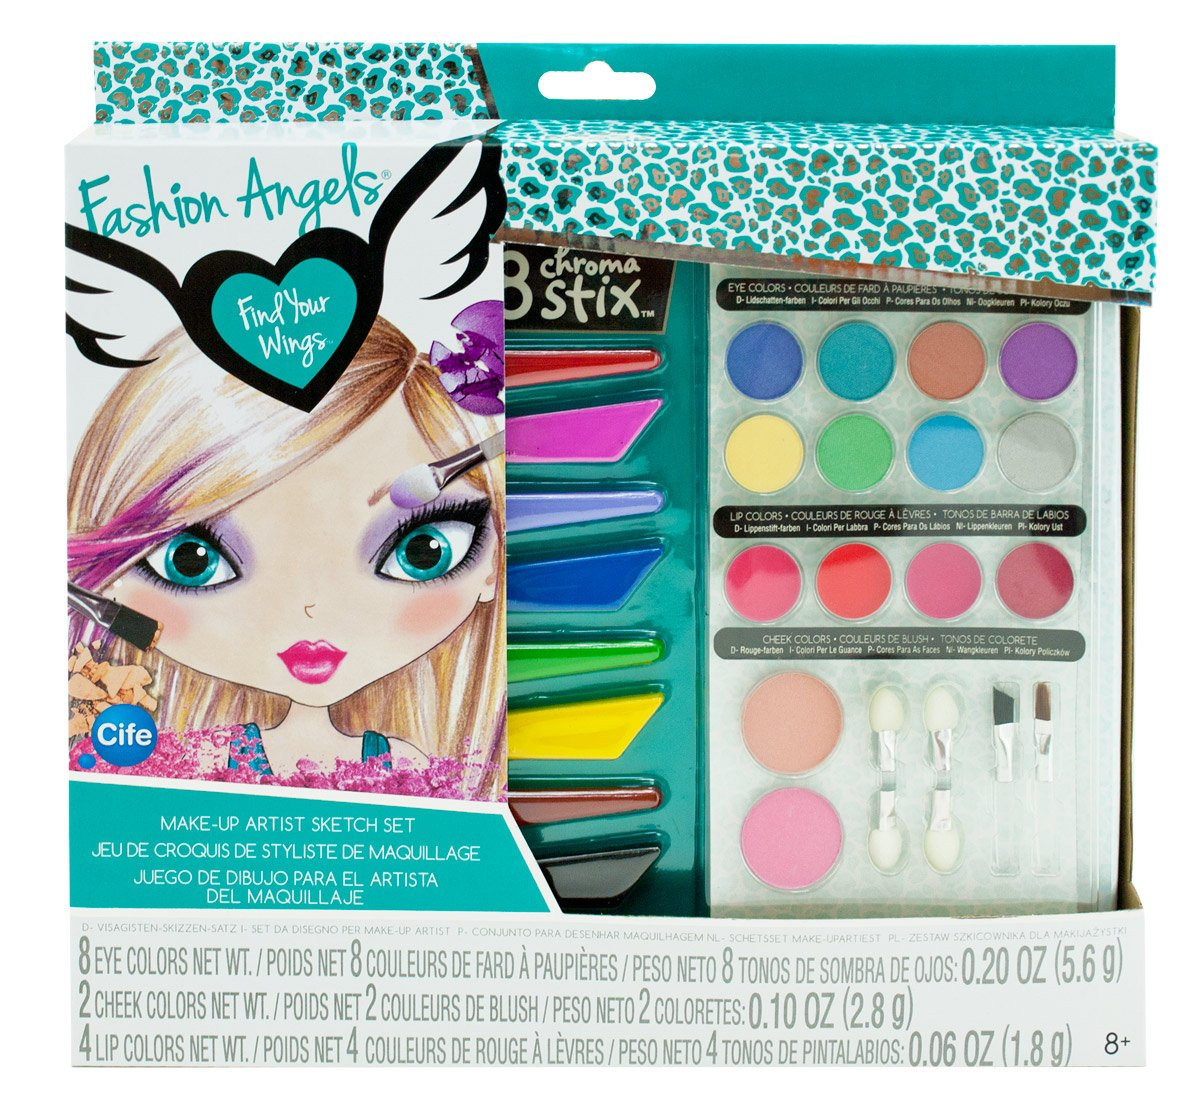 Fashion Angels Set de maquillaje del artista (Cife 86585): Amazon.es ...